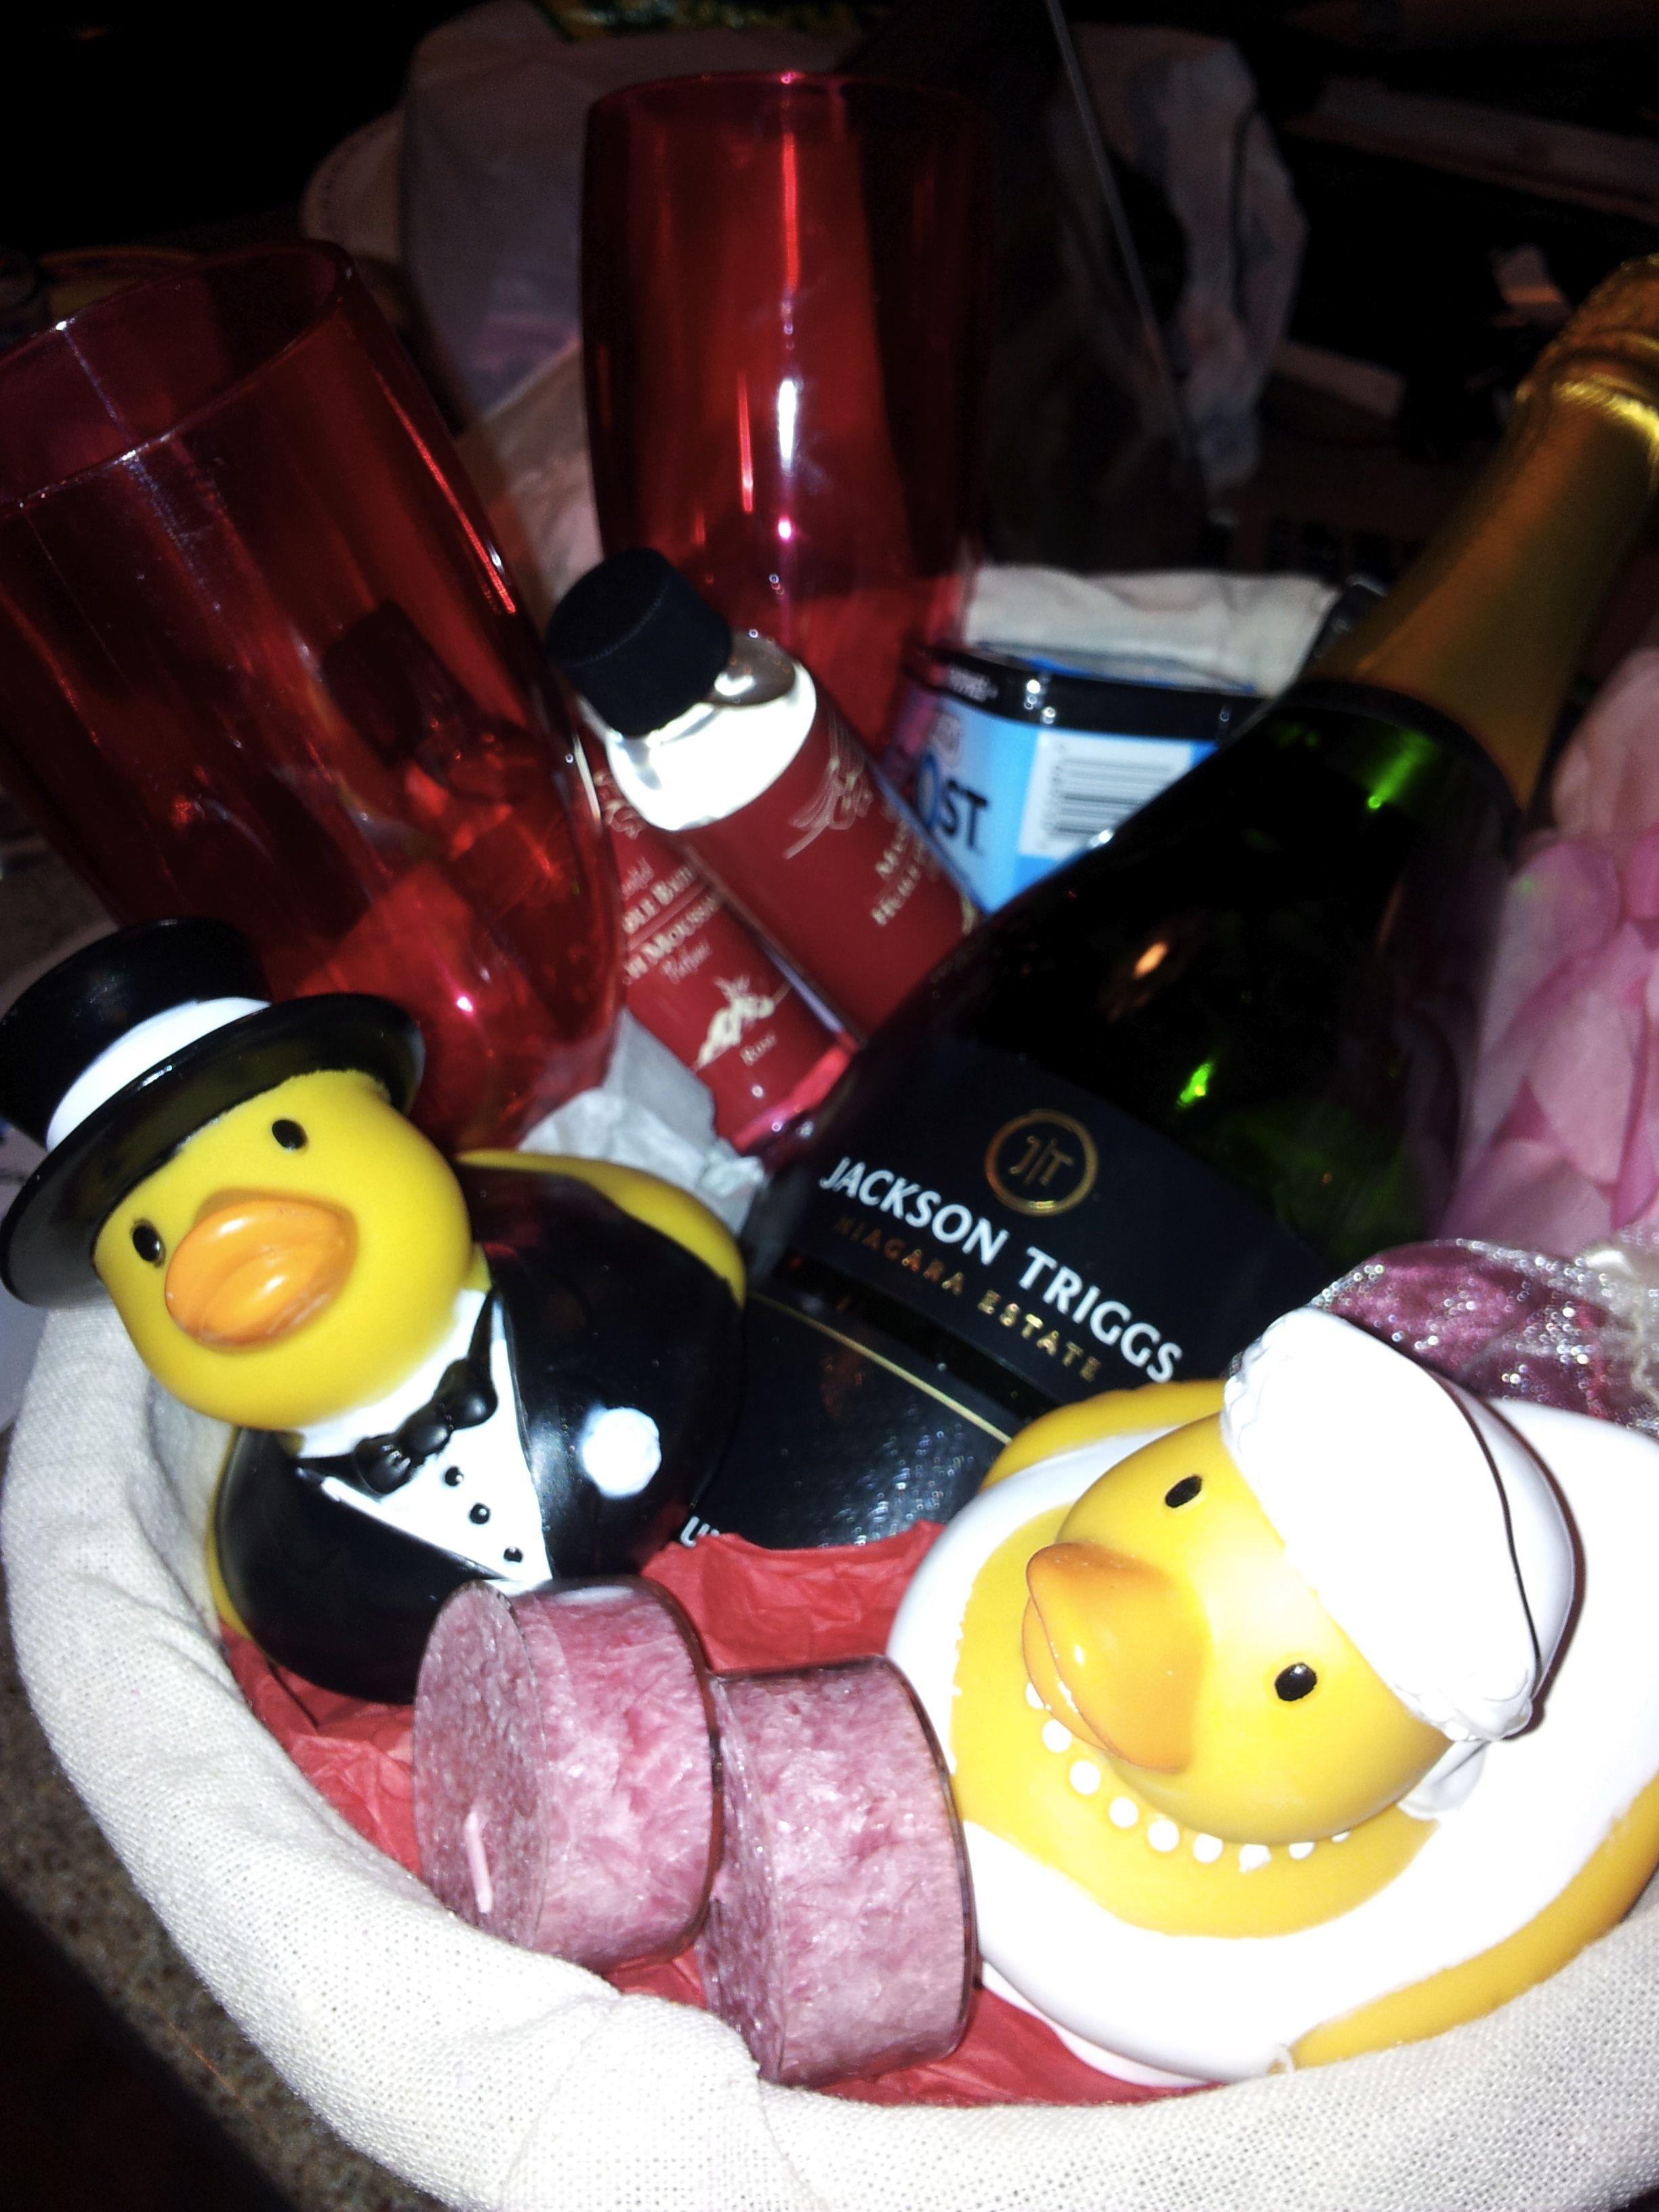 Wedding Night Gift For Groom : wedding tasia s wedding kenna s wedding cece s wedding aubrey wedding ...